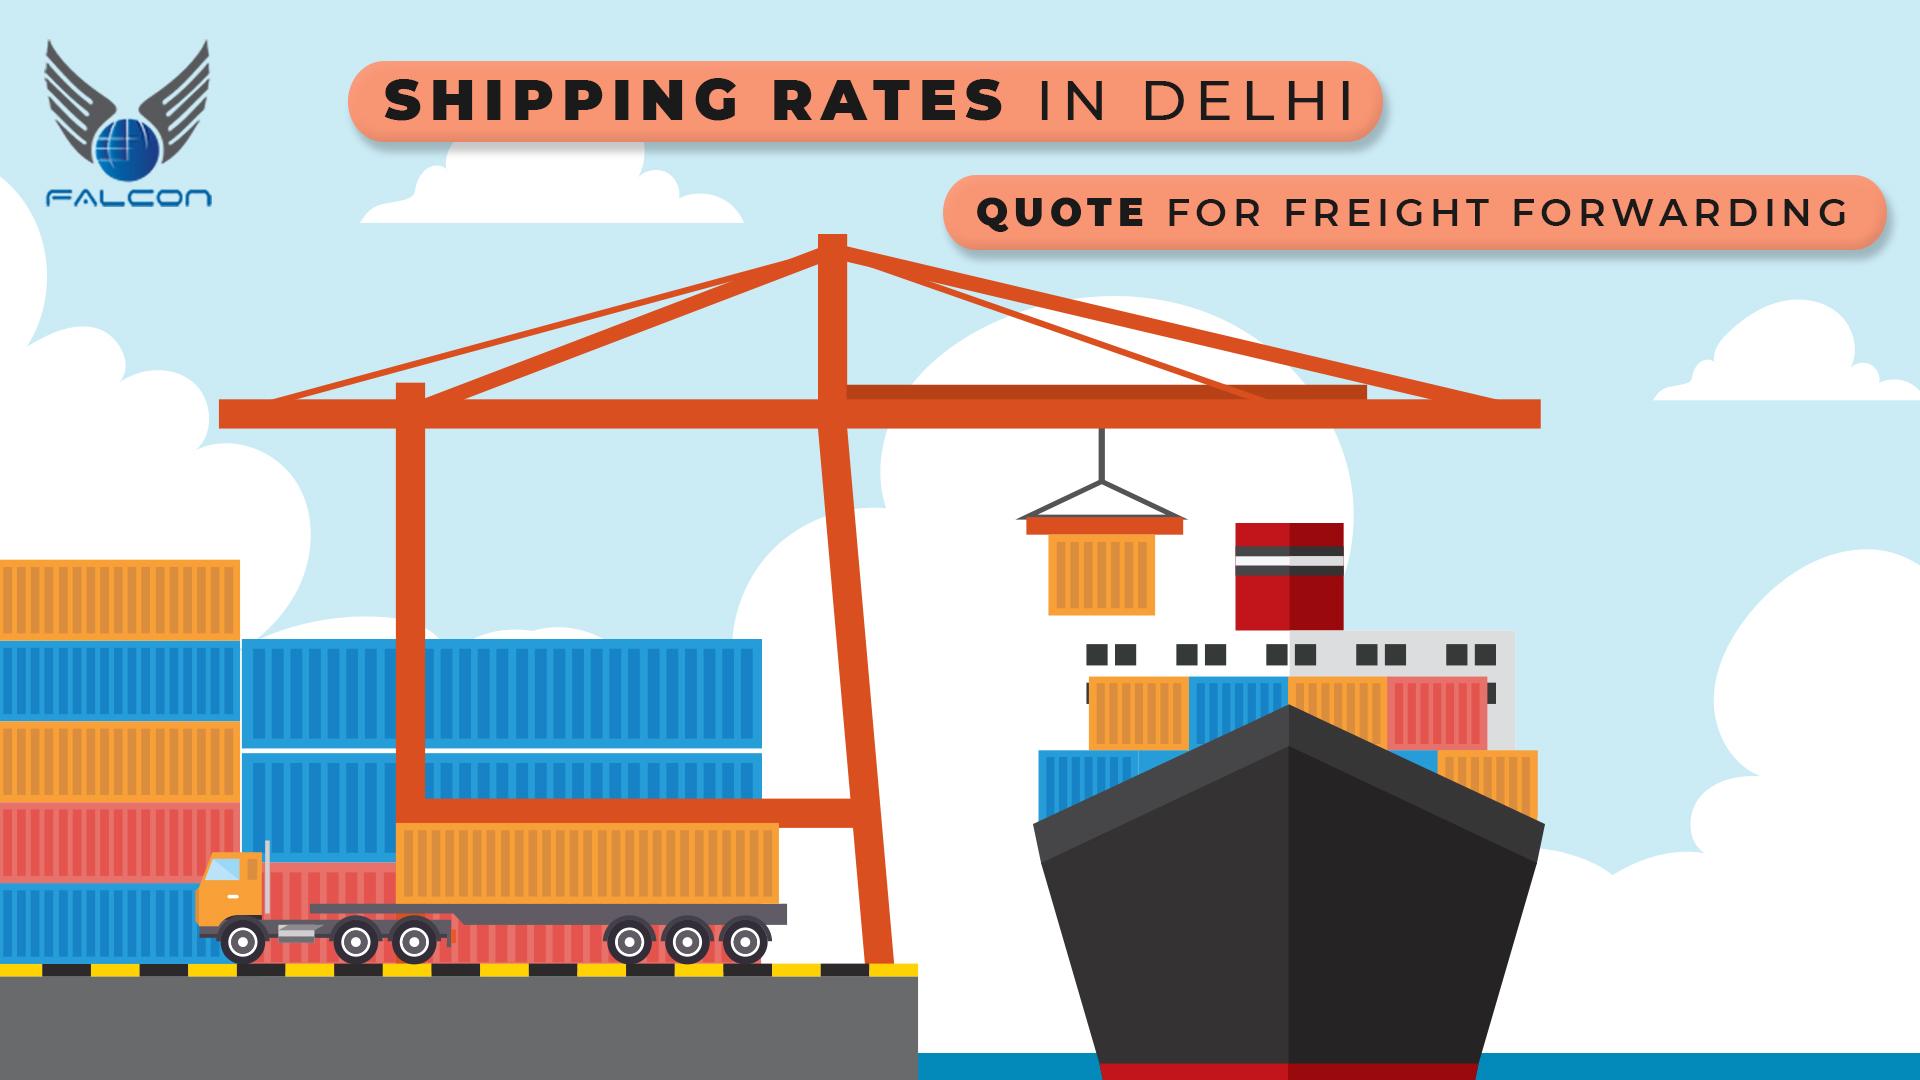 Shipping rates in Delhi